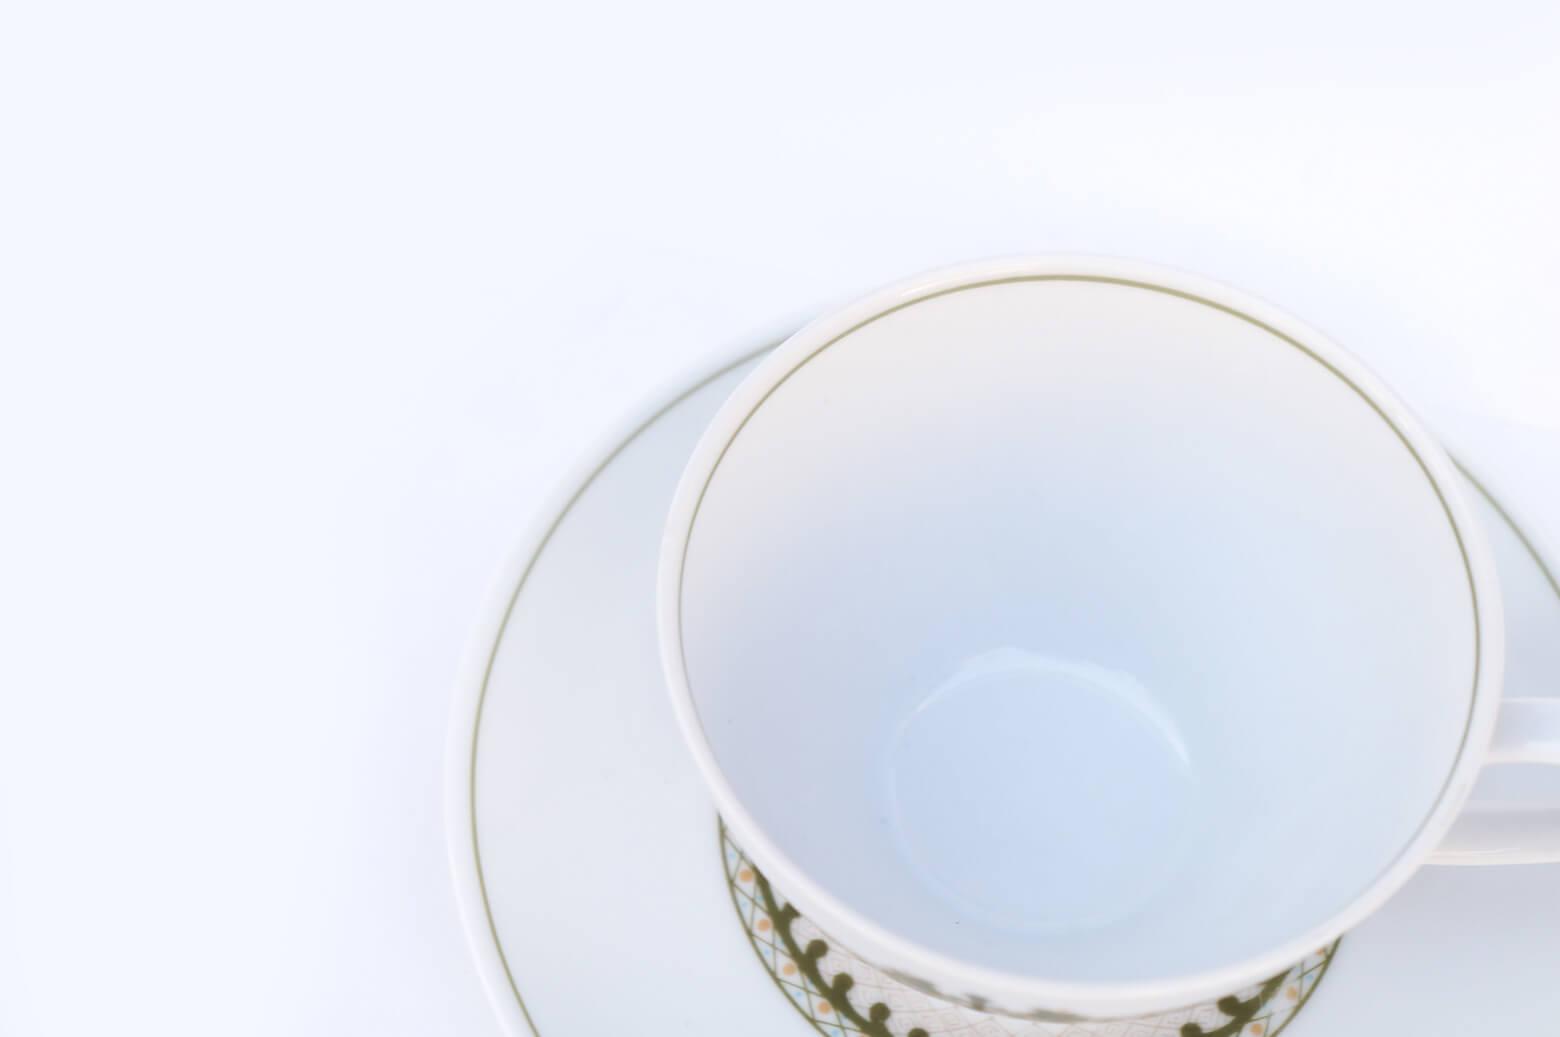 Vintage Noritake Cup and Saucer Hermitage U.S. Pattern Tableware/ノリタケ カップ アンド ソーサー エルミタージュ テーブルウェア レトロ ヴィンテージ食器 7